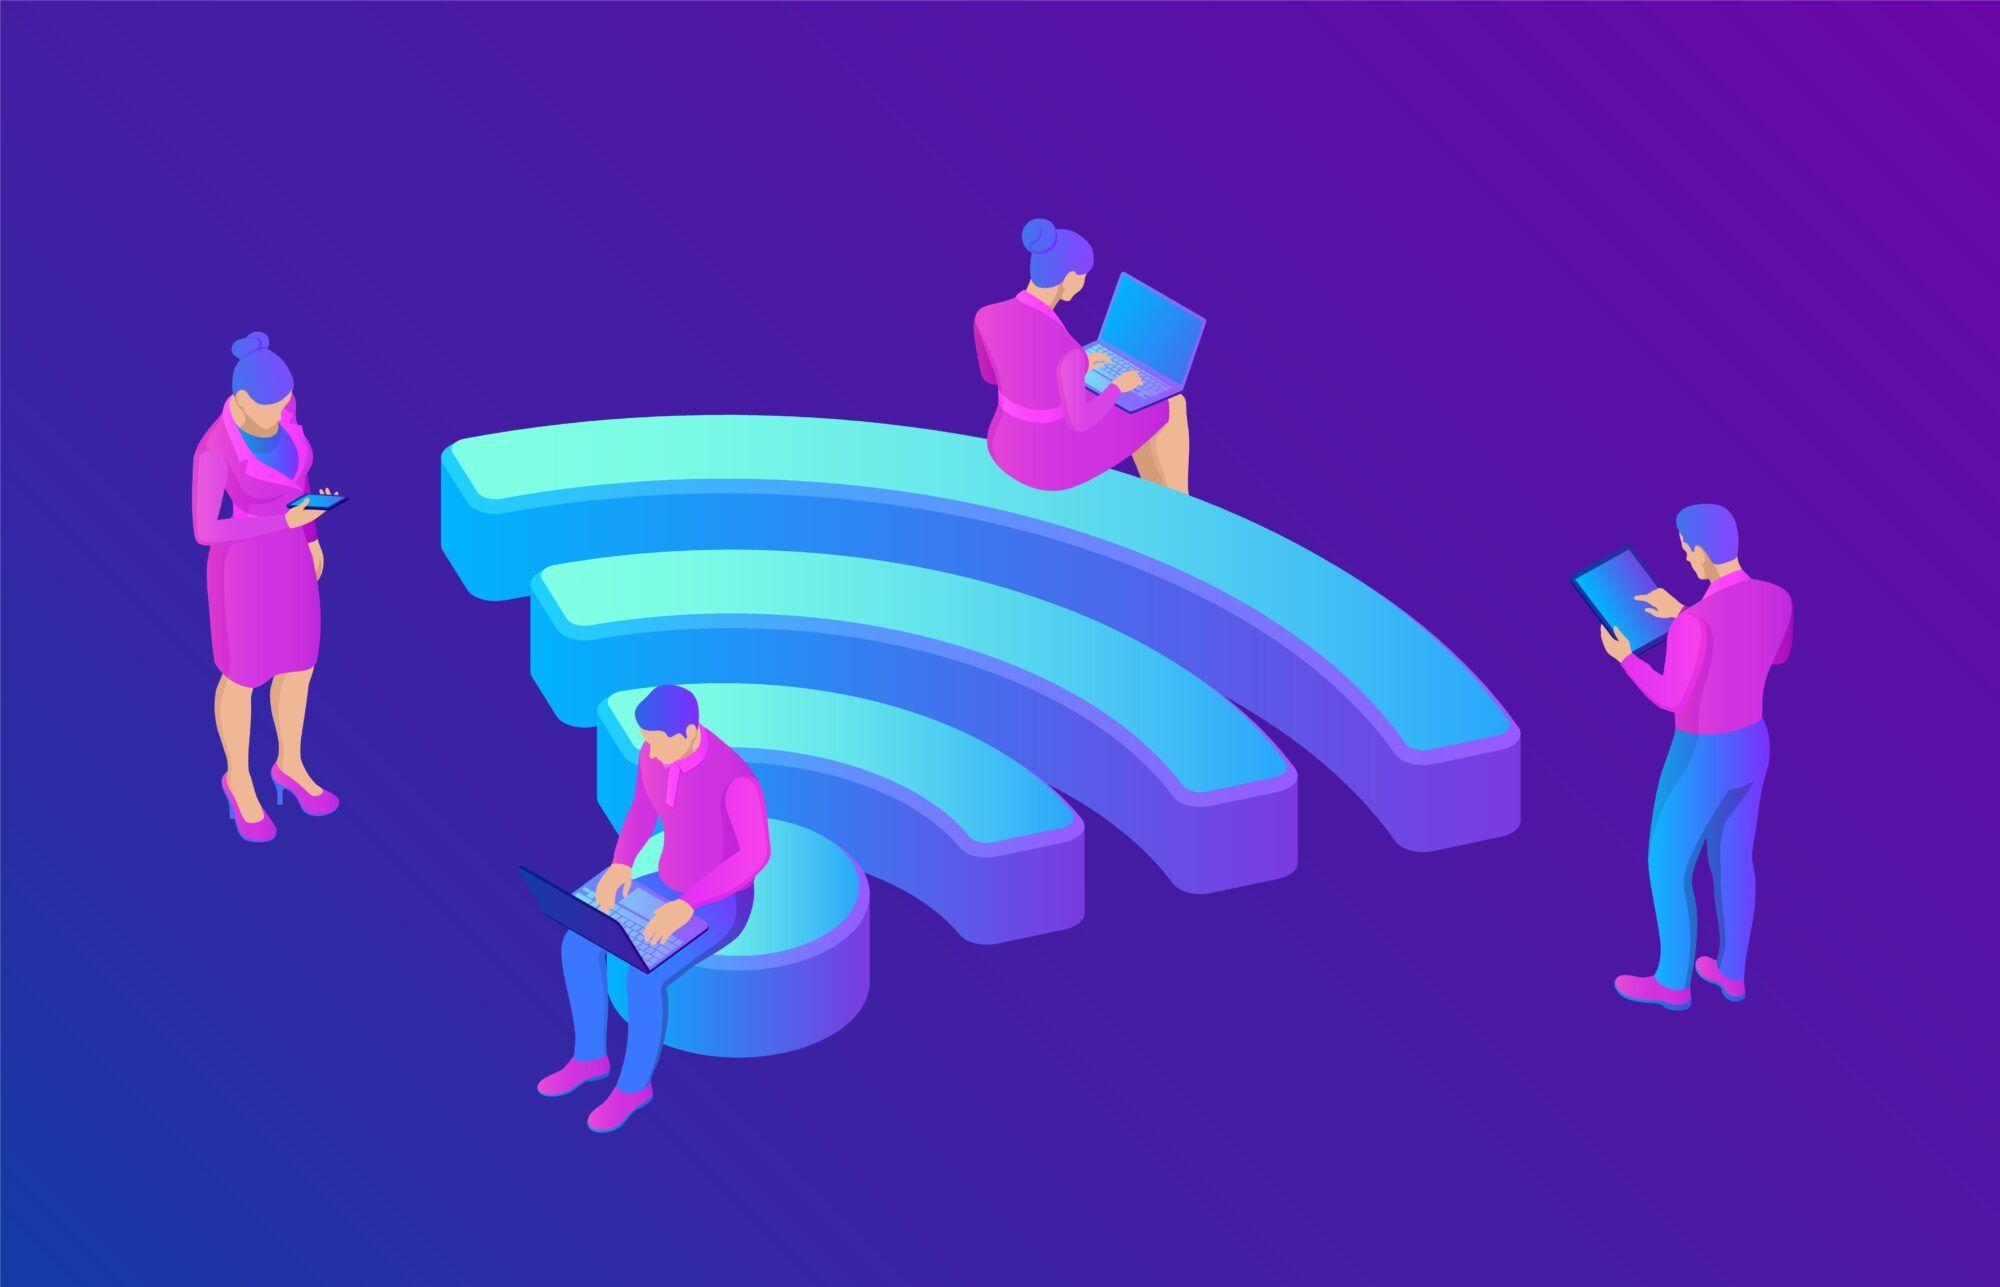 partage de connexion, Activer le partage de connexion sur son smartphone Android